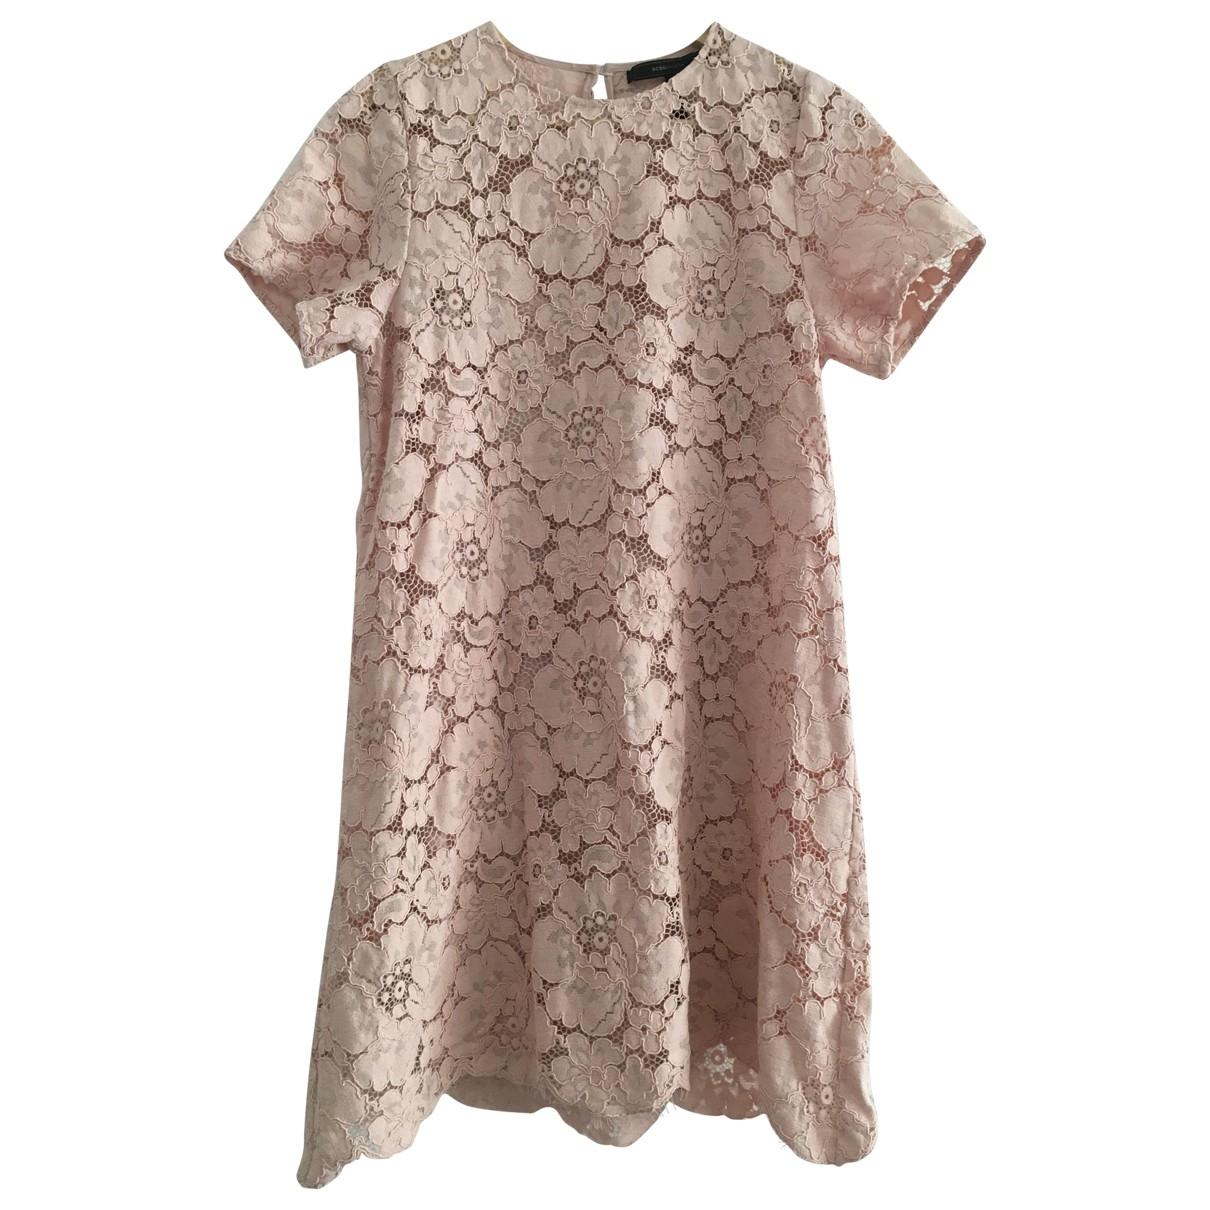 Bcbg Max Azria \N Pink Cotton - elasthane dress for Women XS International